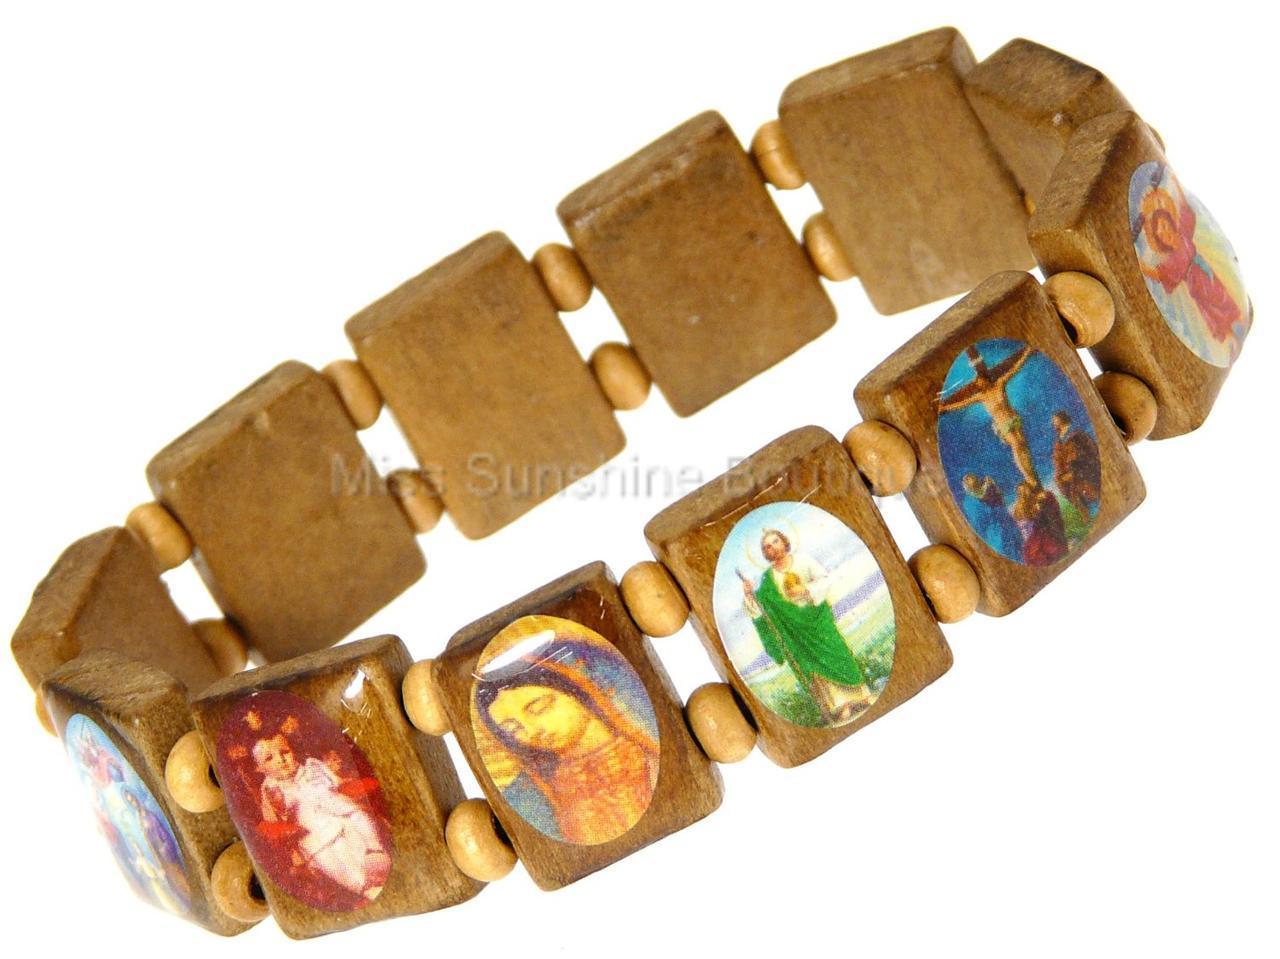 all saints religious catholic christian jesus wooden wood